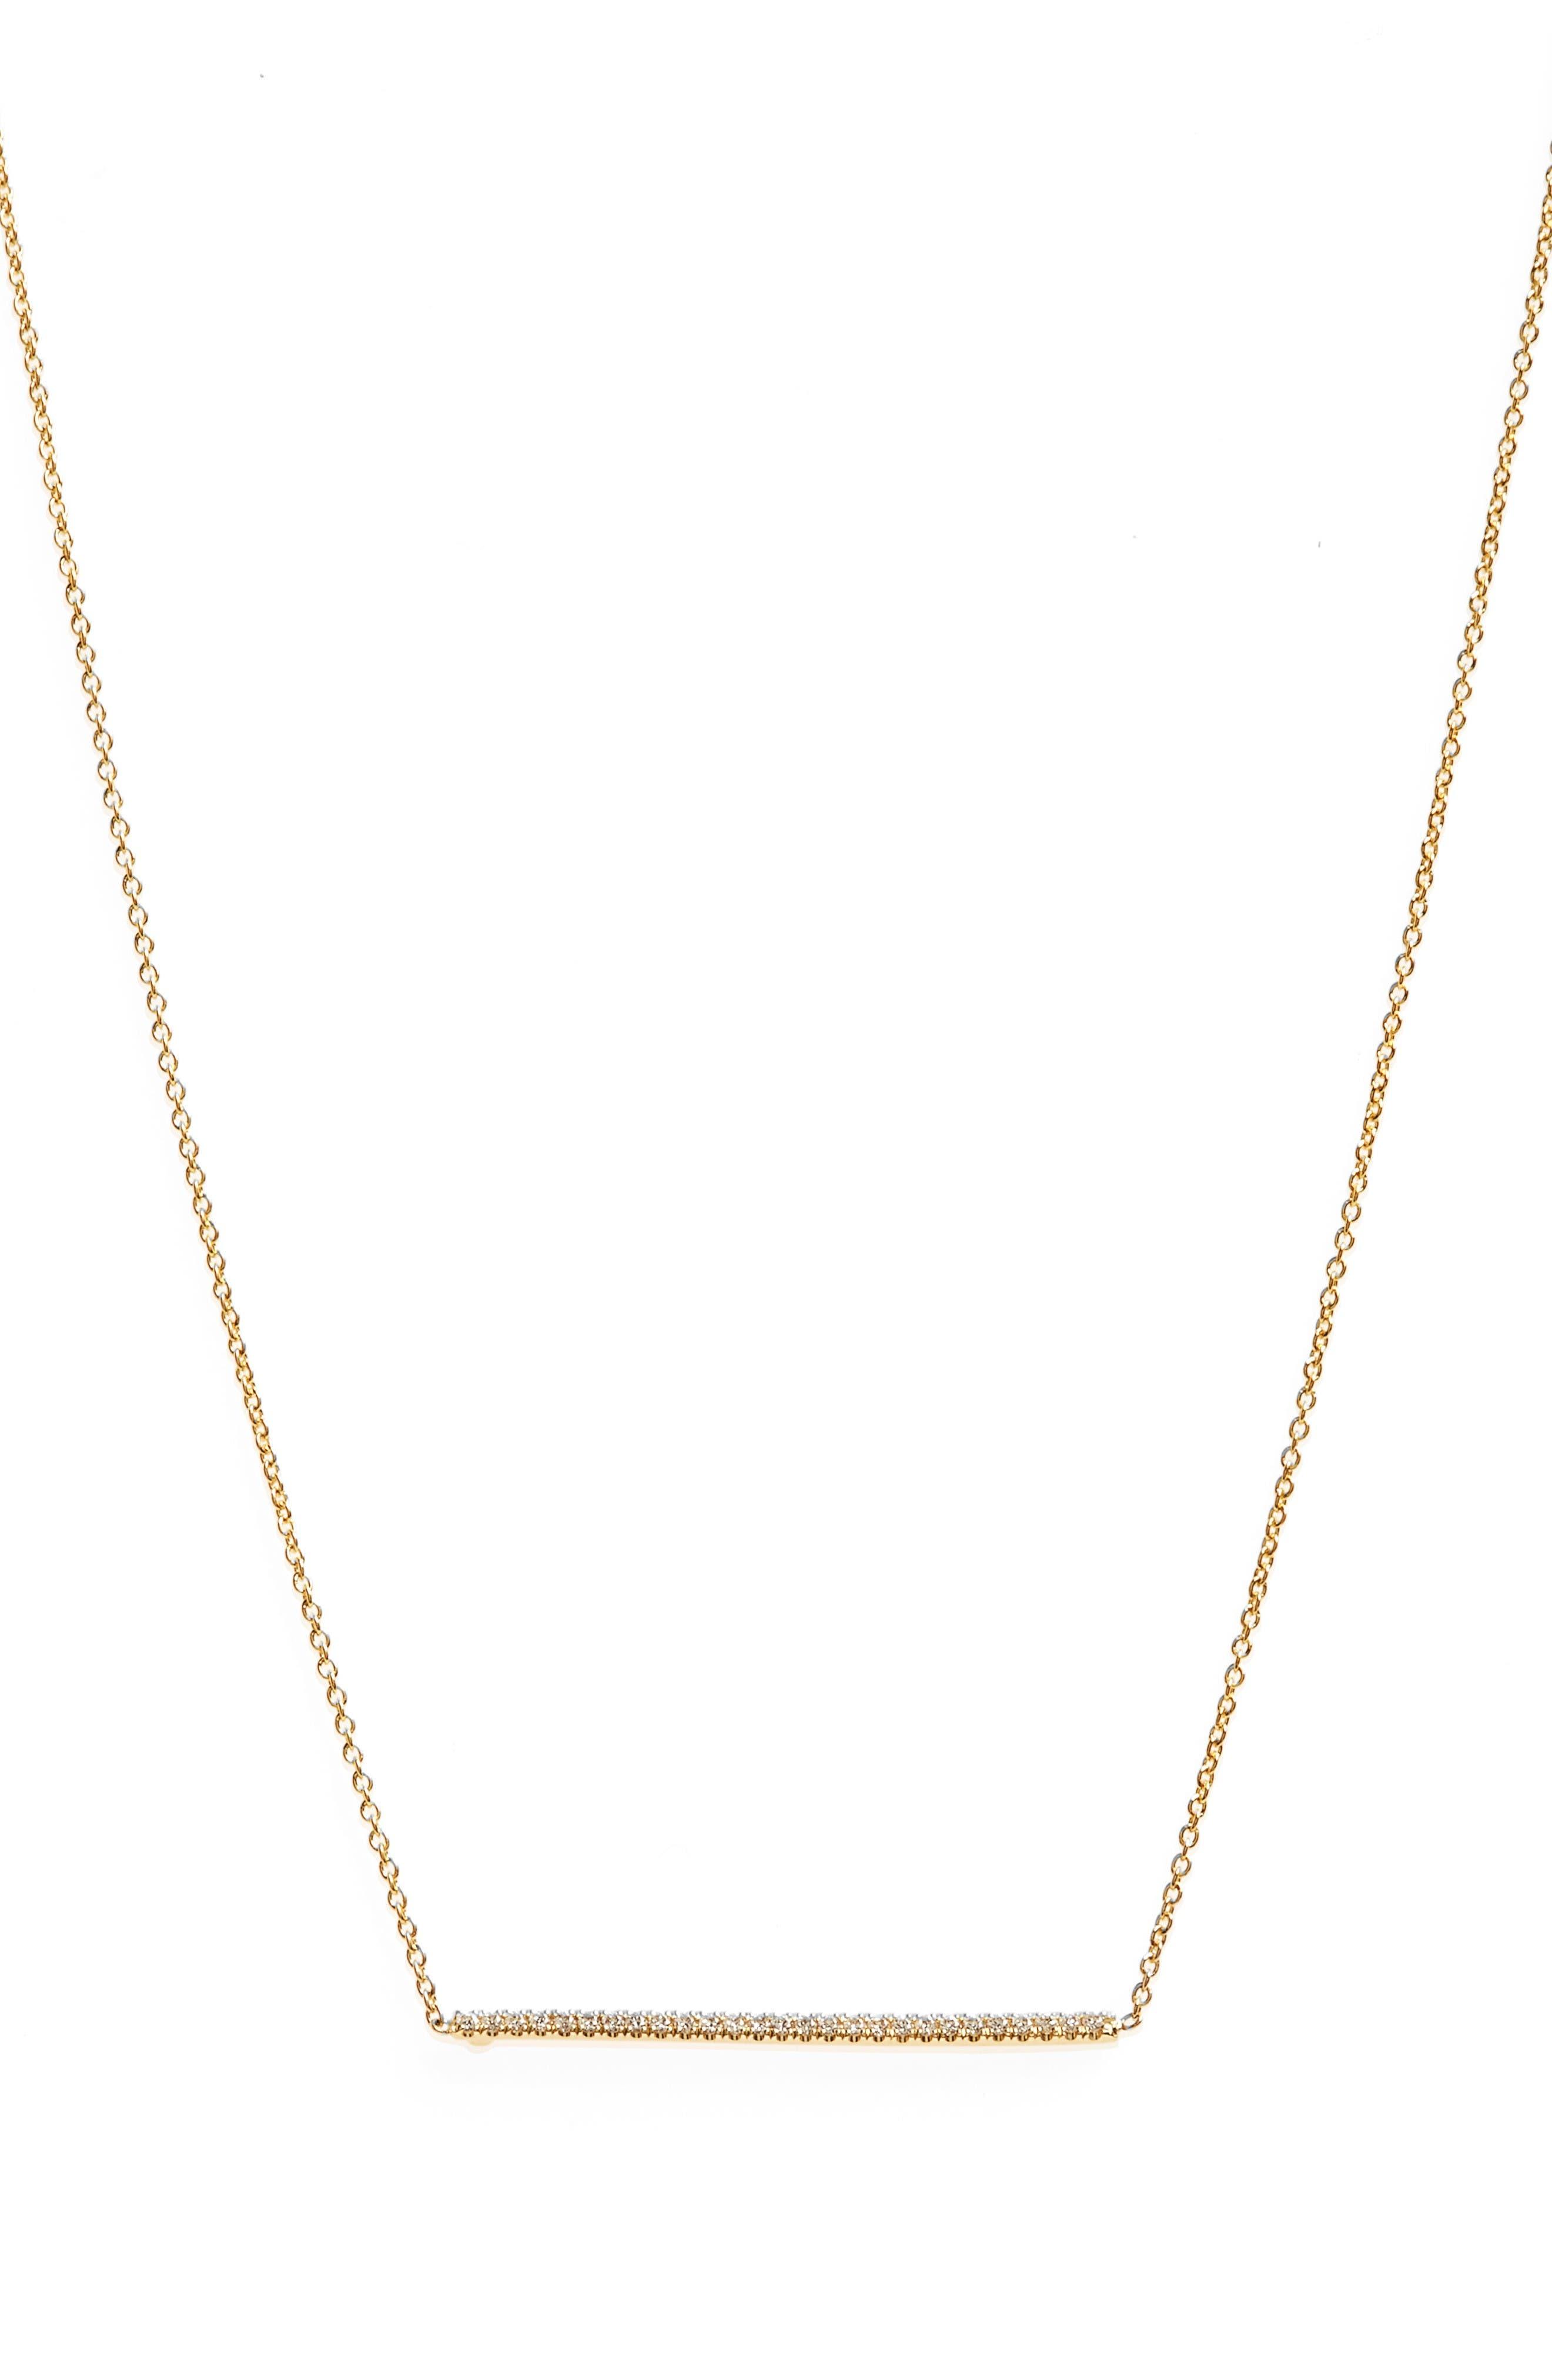 ROBERTO COIN Tiny Treasures Diamond Bar Necklace